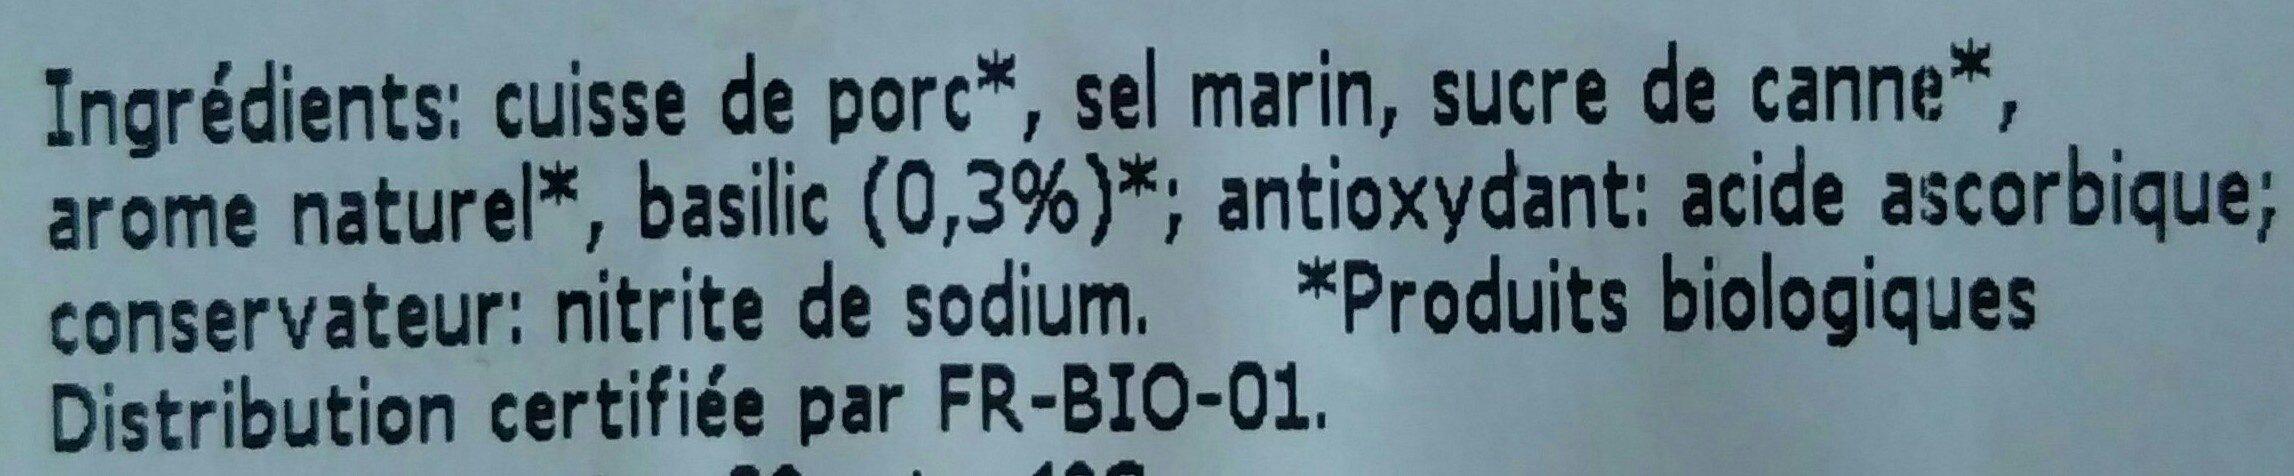 Prosciutto Con Basilico - Ingredients